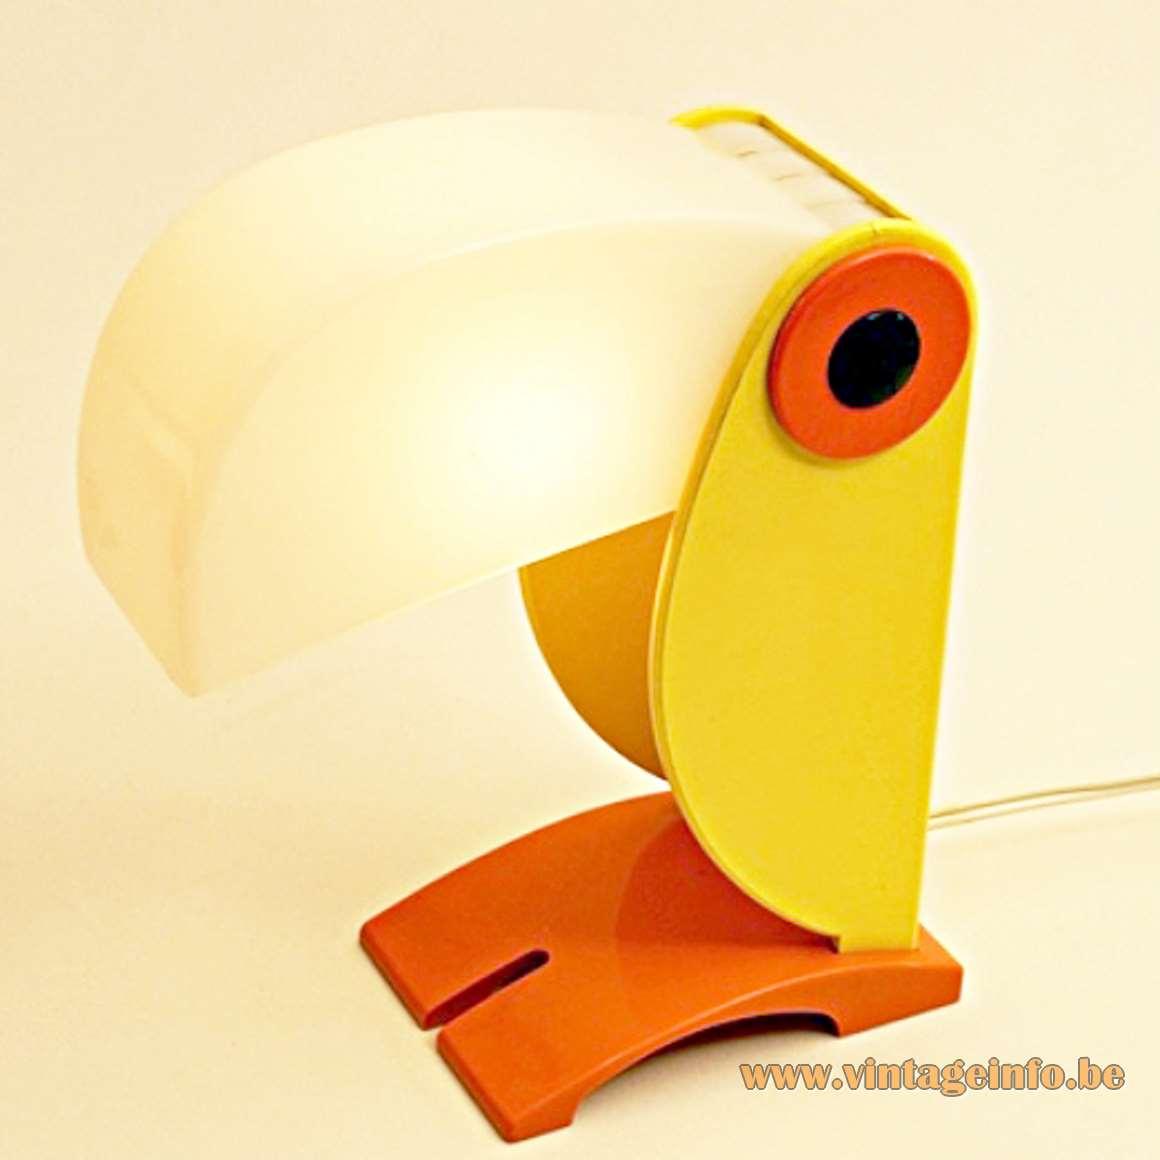 Toucan Table Lamp - Old Timer Ferrari - Yellow